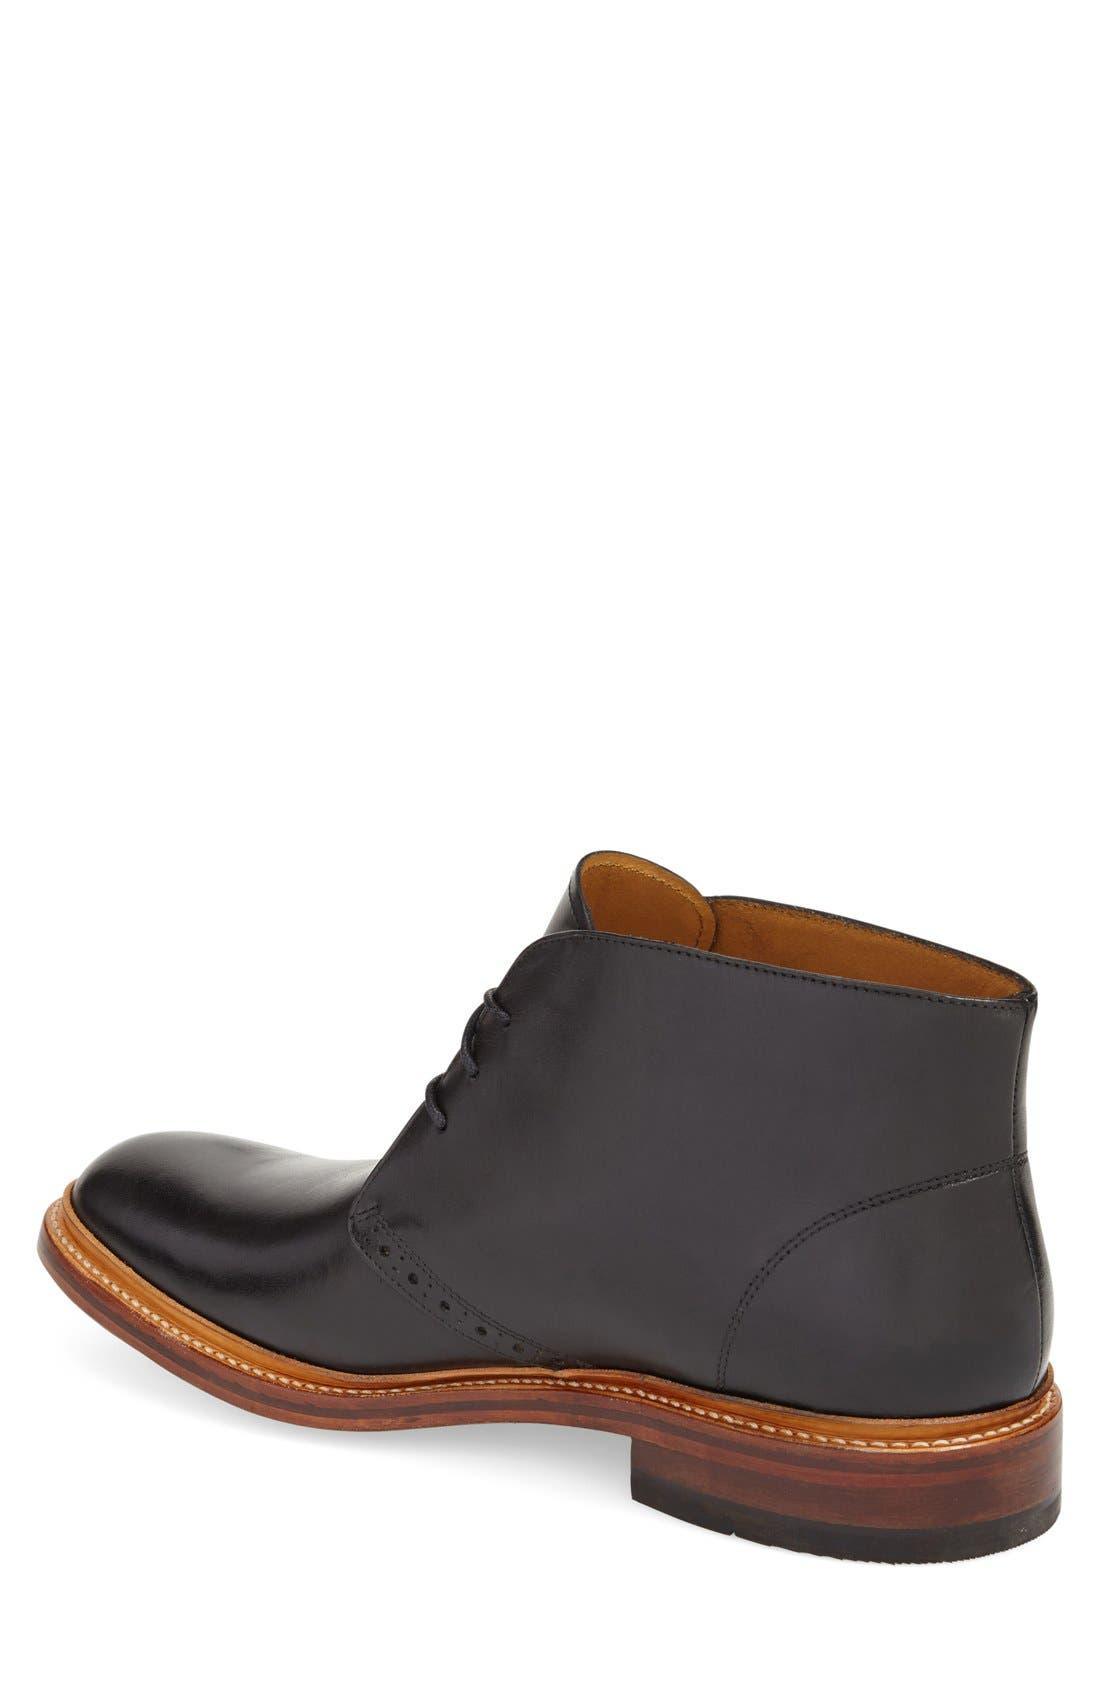 'Madison II' Chukka Boot,                             Alternate thumbnail 2, color,                             Black Smooth Leather